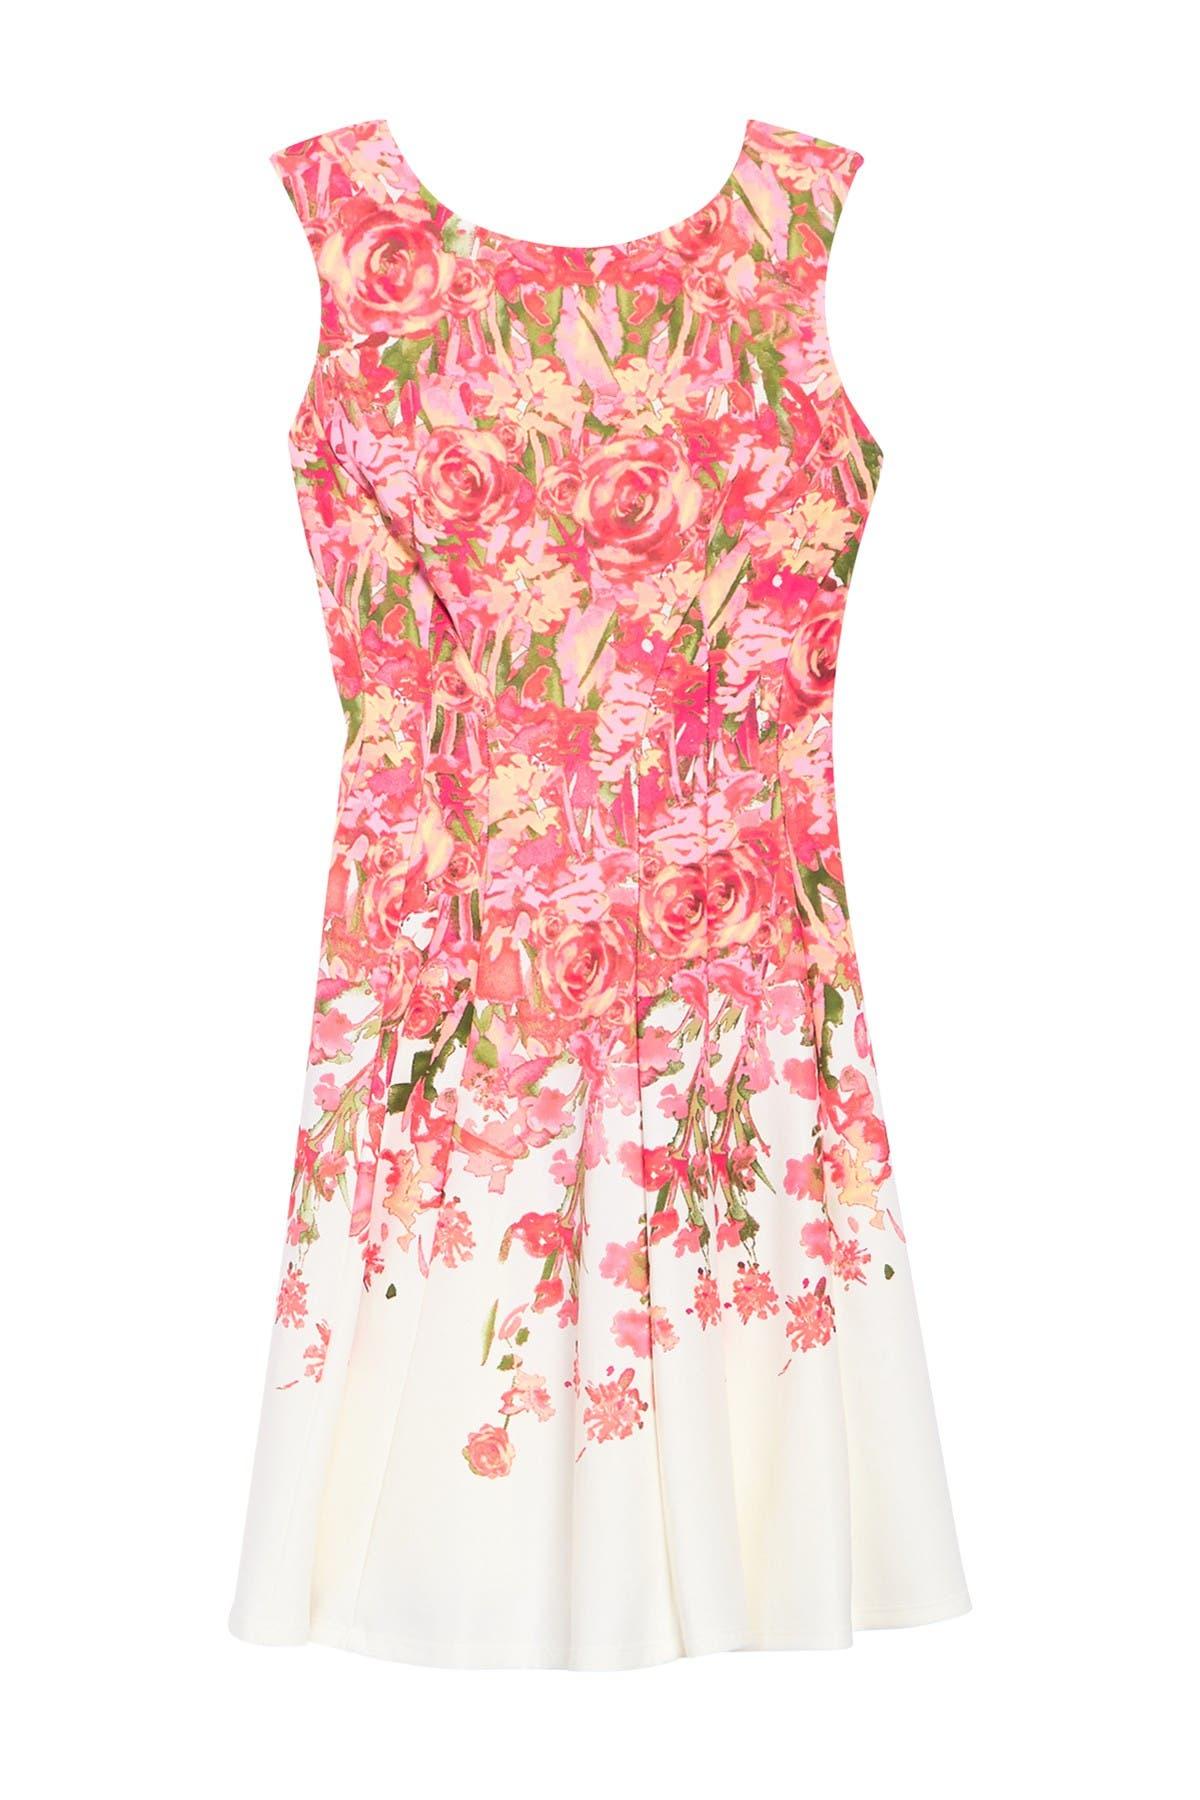 Image of Gabby Skye Sleeveless Floral Print Scuba Dress